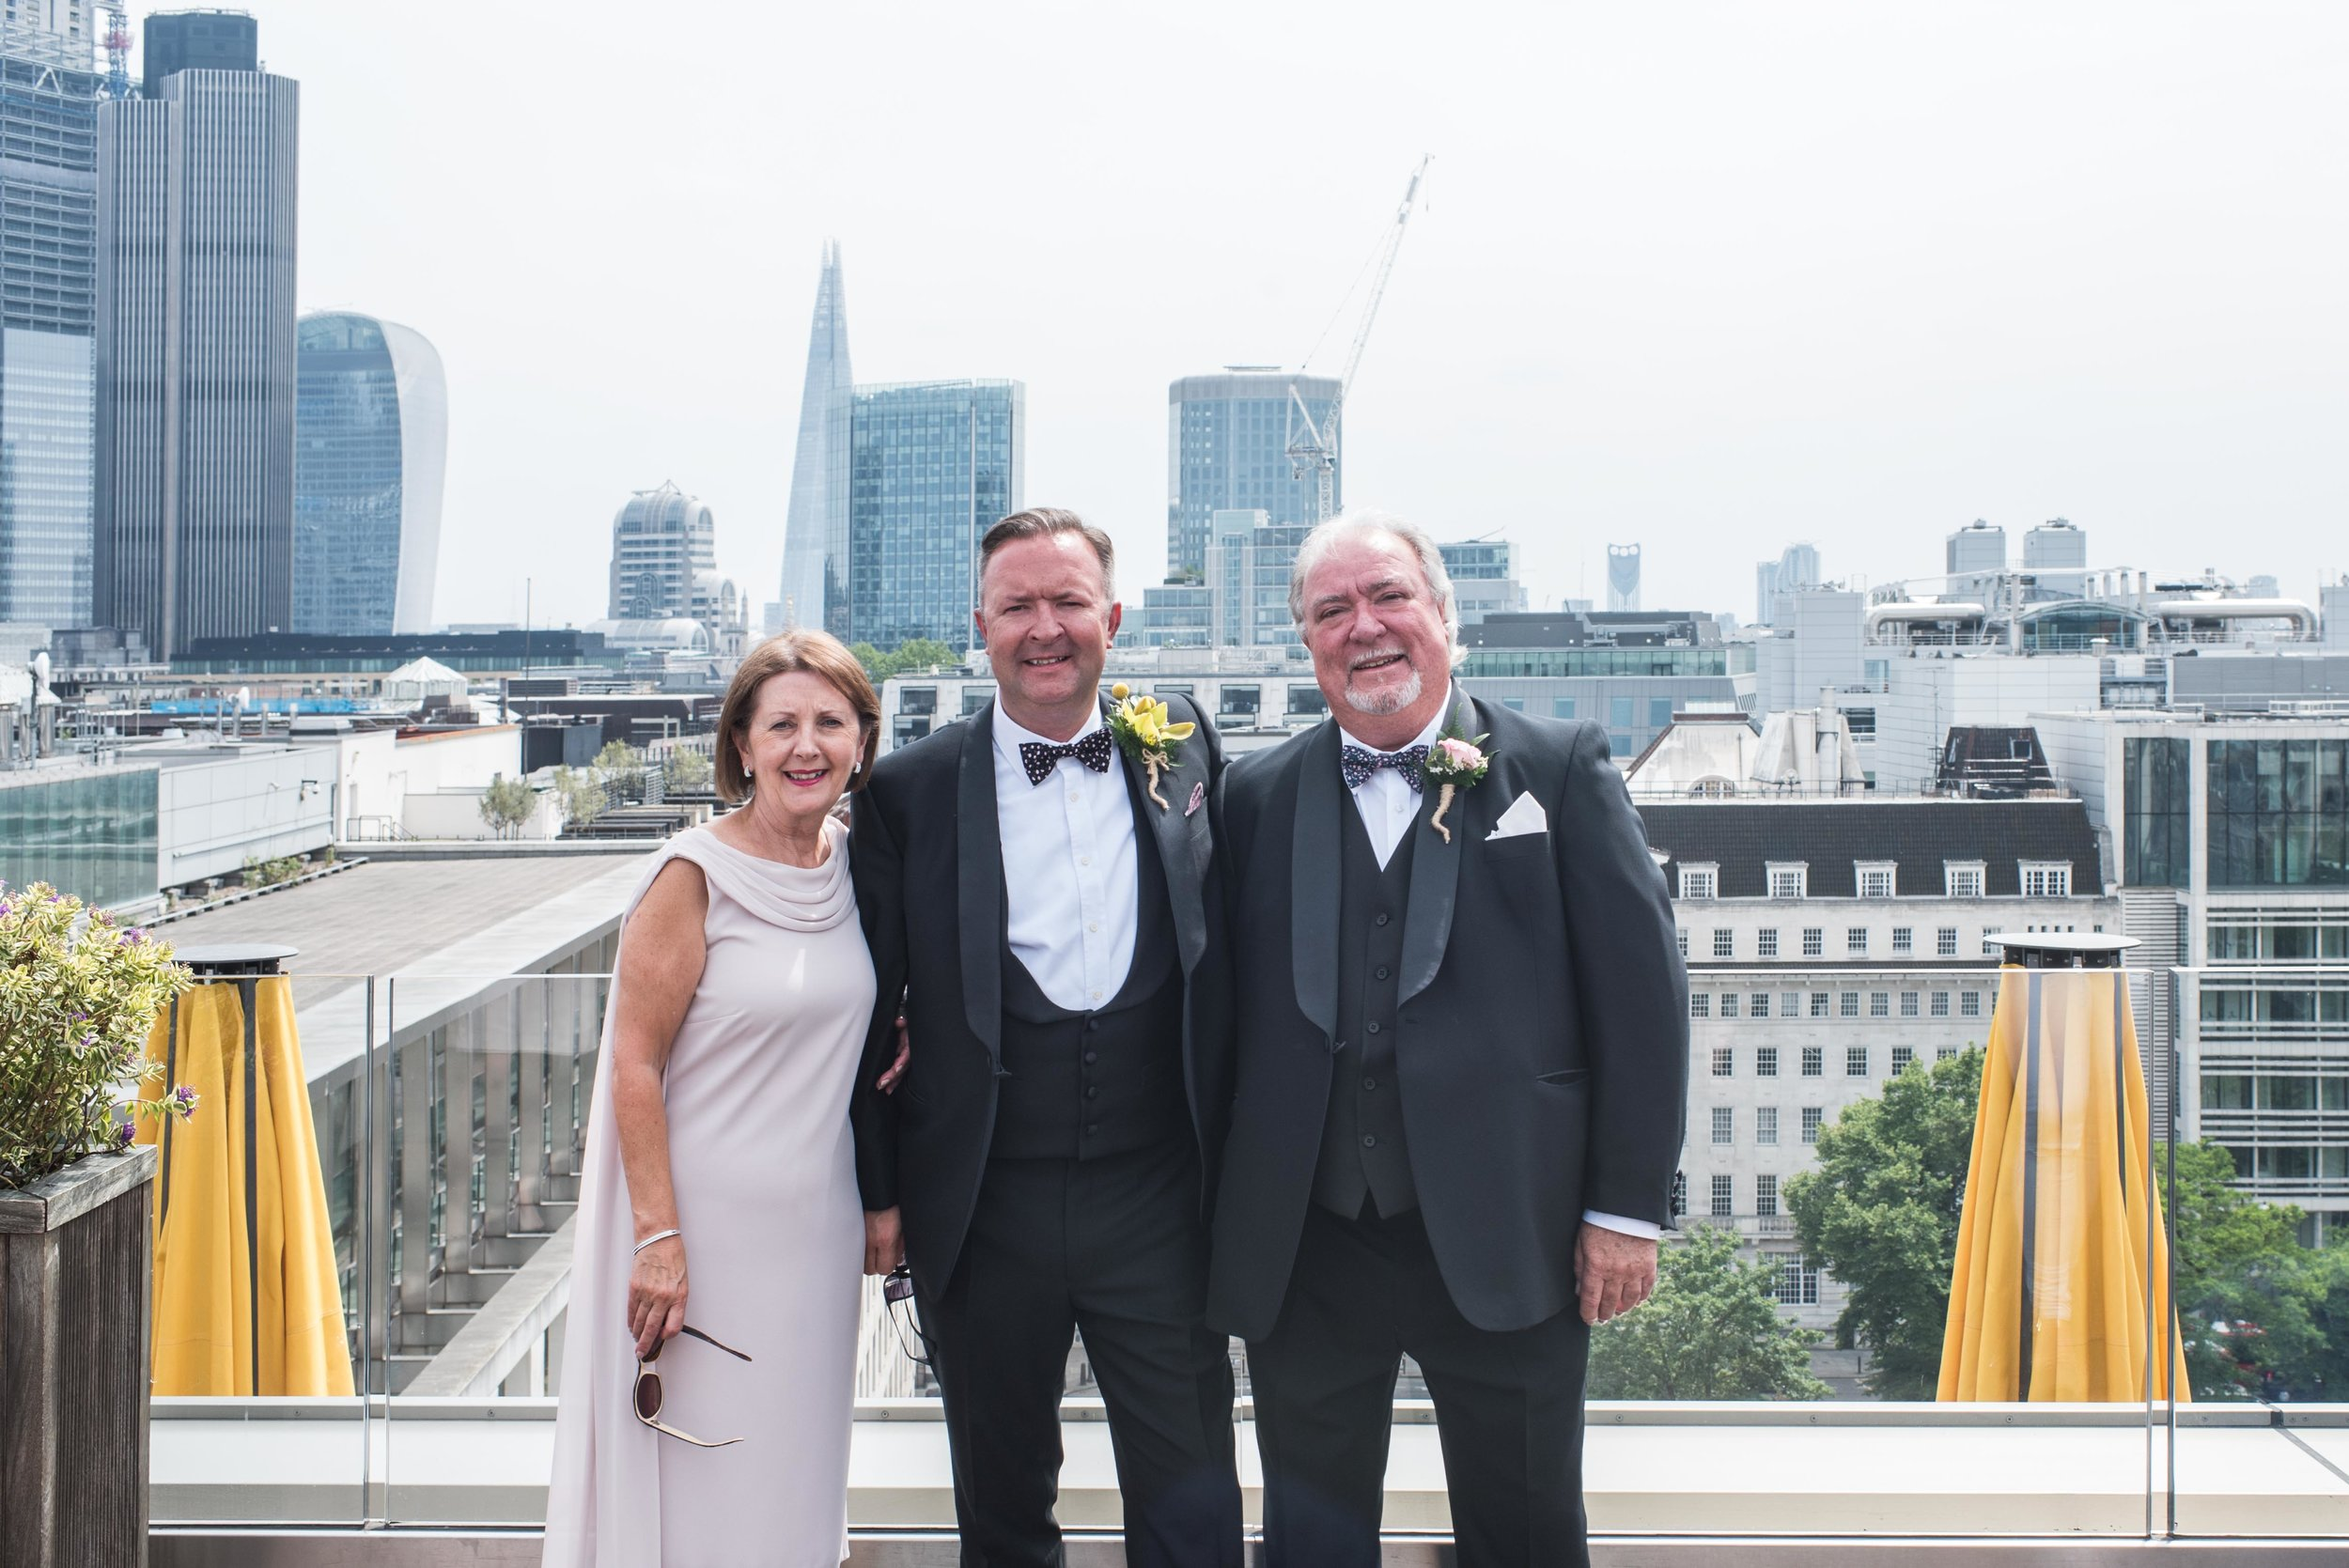 D&M_Marylebone Town Hall Wedding (32 of 239).jpg